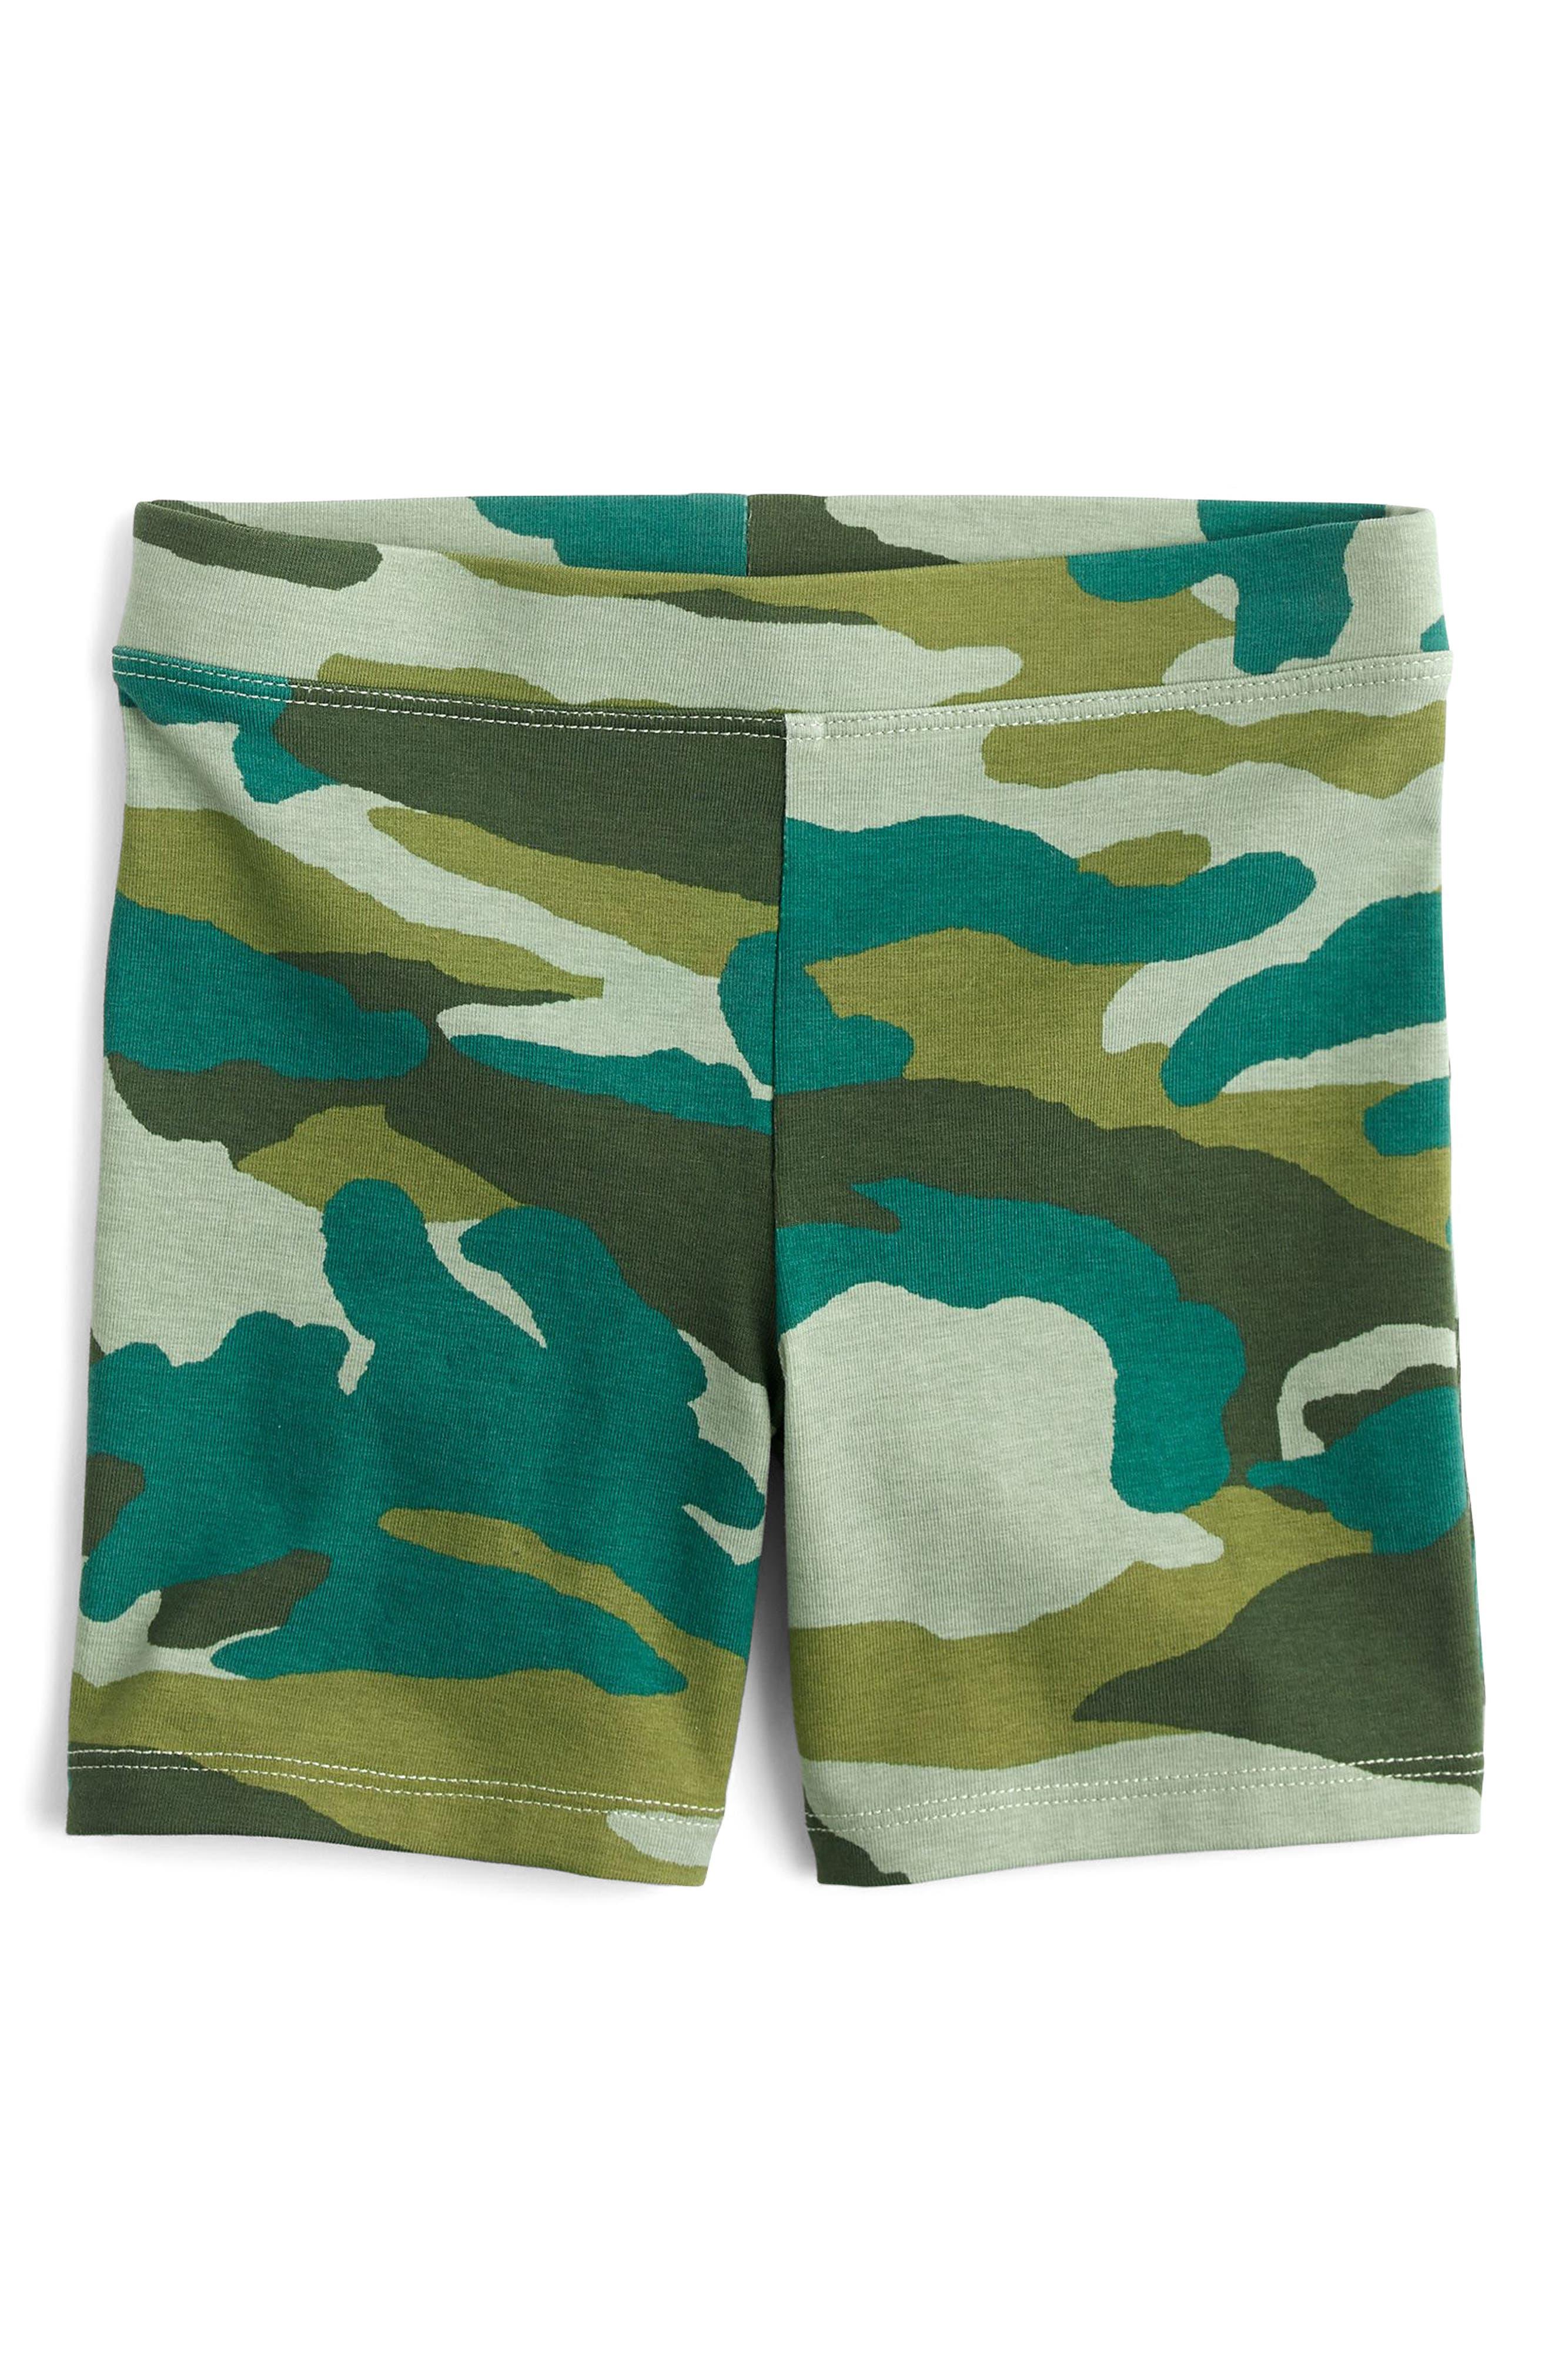 Camo Bike Shorts,                             Main thumbnail 1, color,                             300